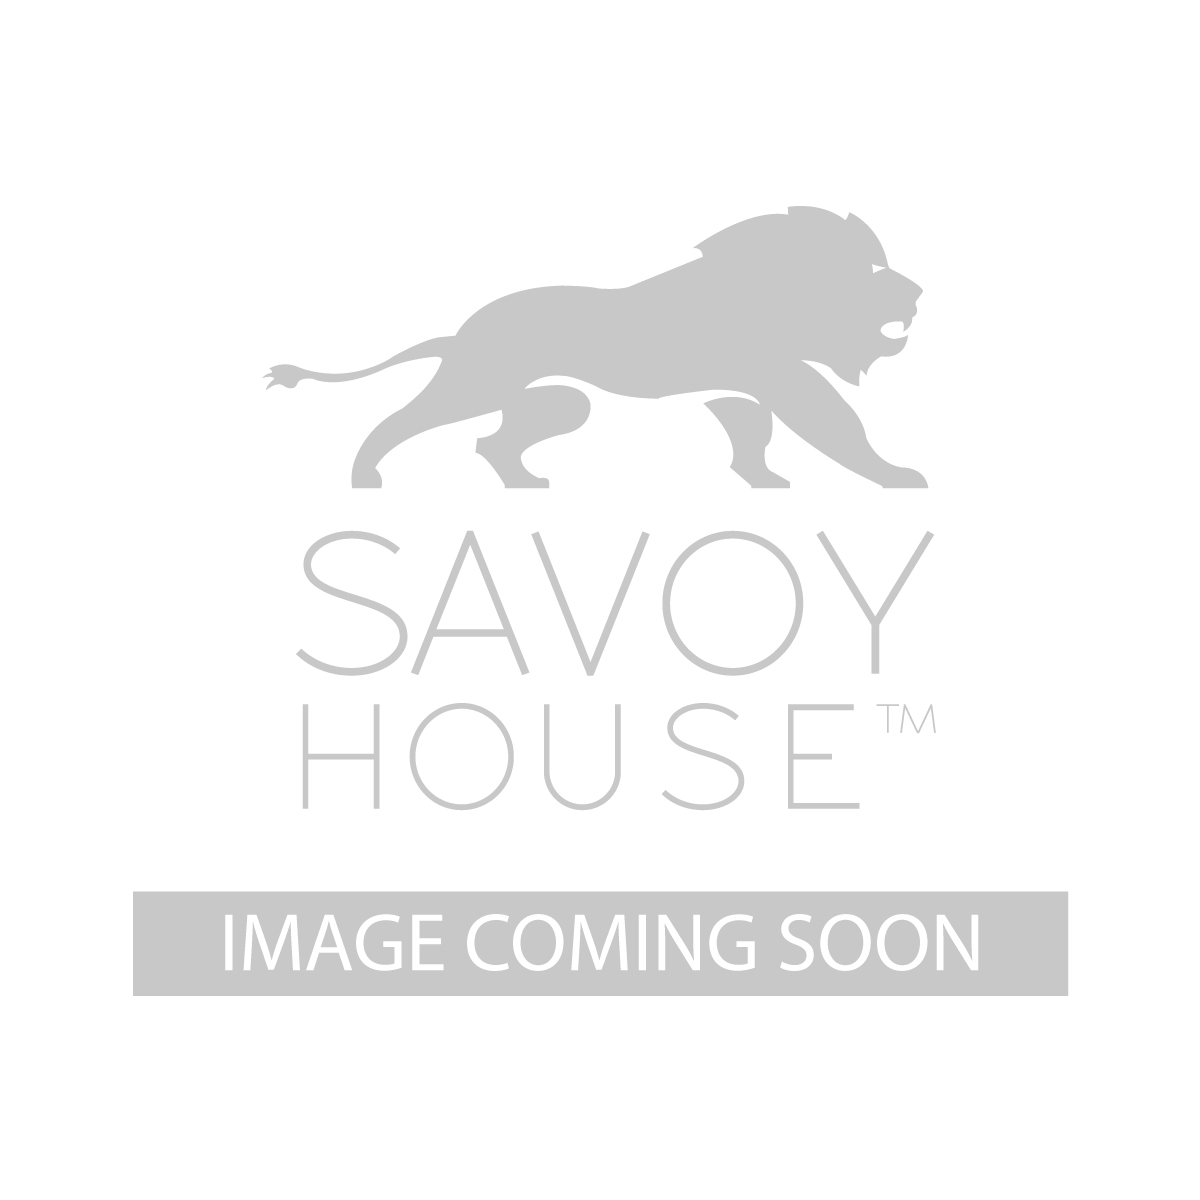 Hartford 1 Light Sconce  sc 1 st  Savoy House & 9-100-1-109 Hartford 1 Light Sconce by Savoy House azcodes.com